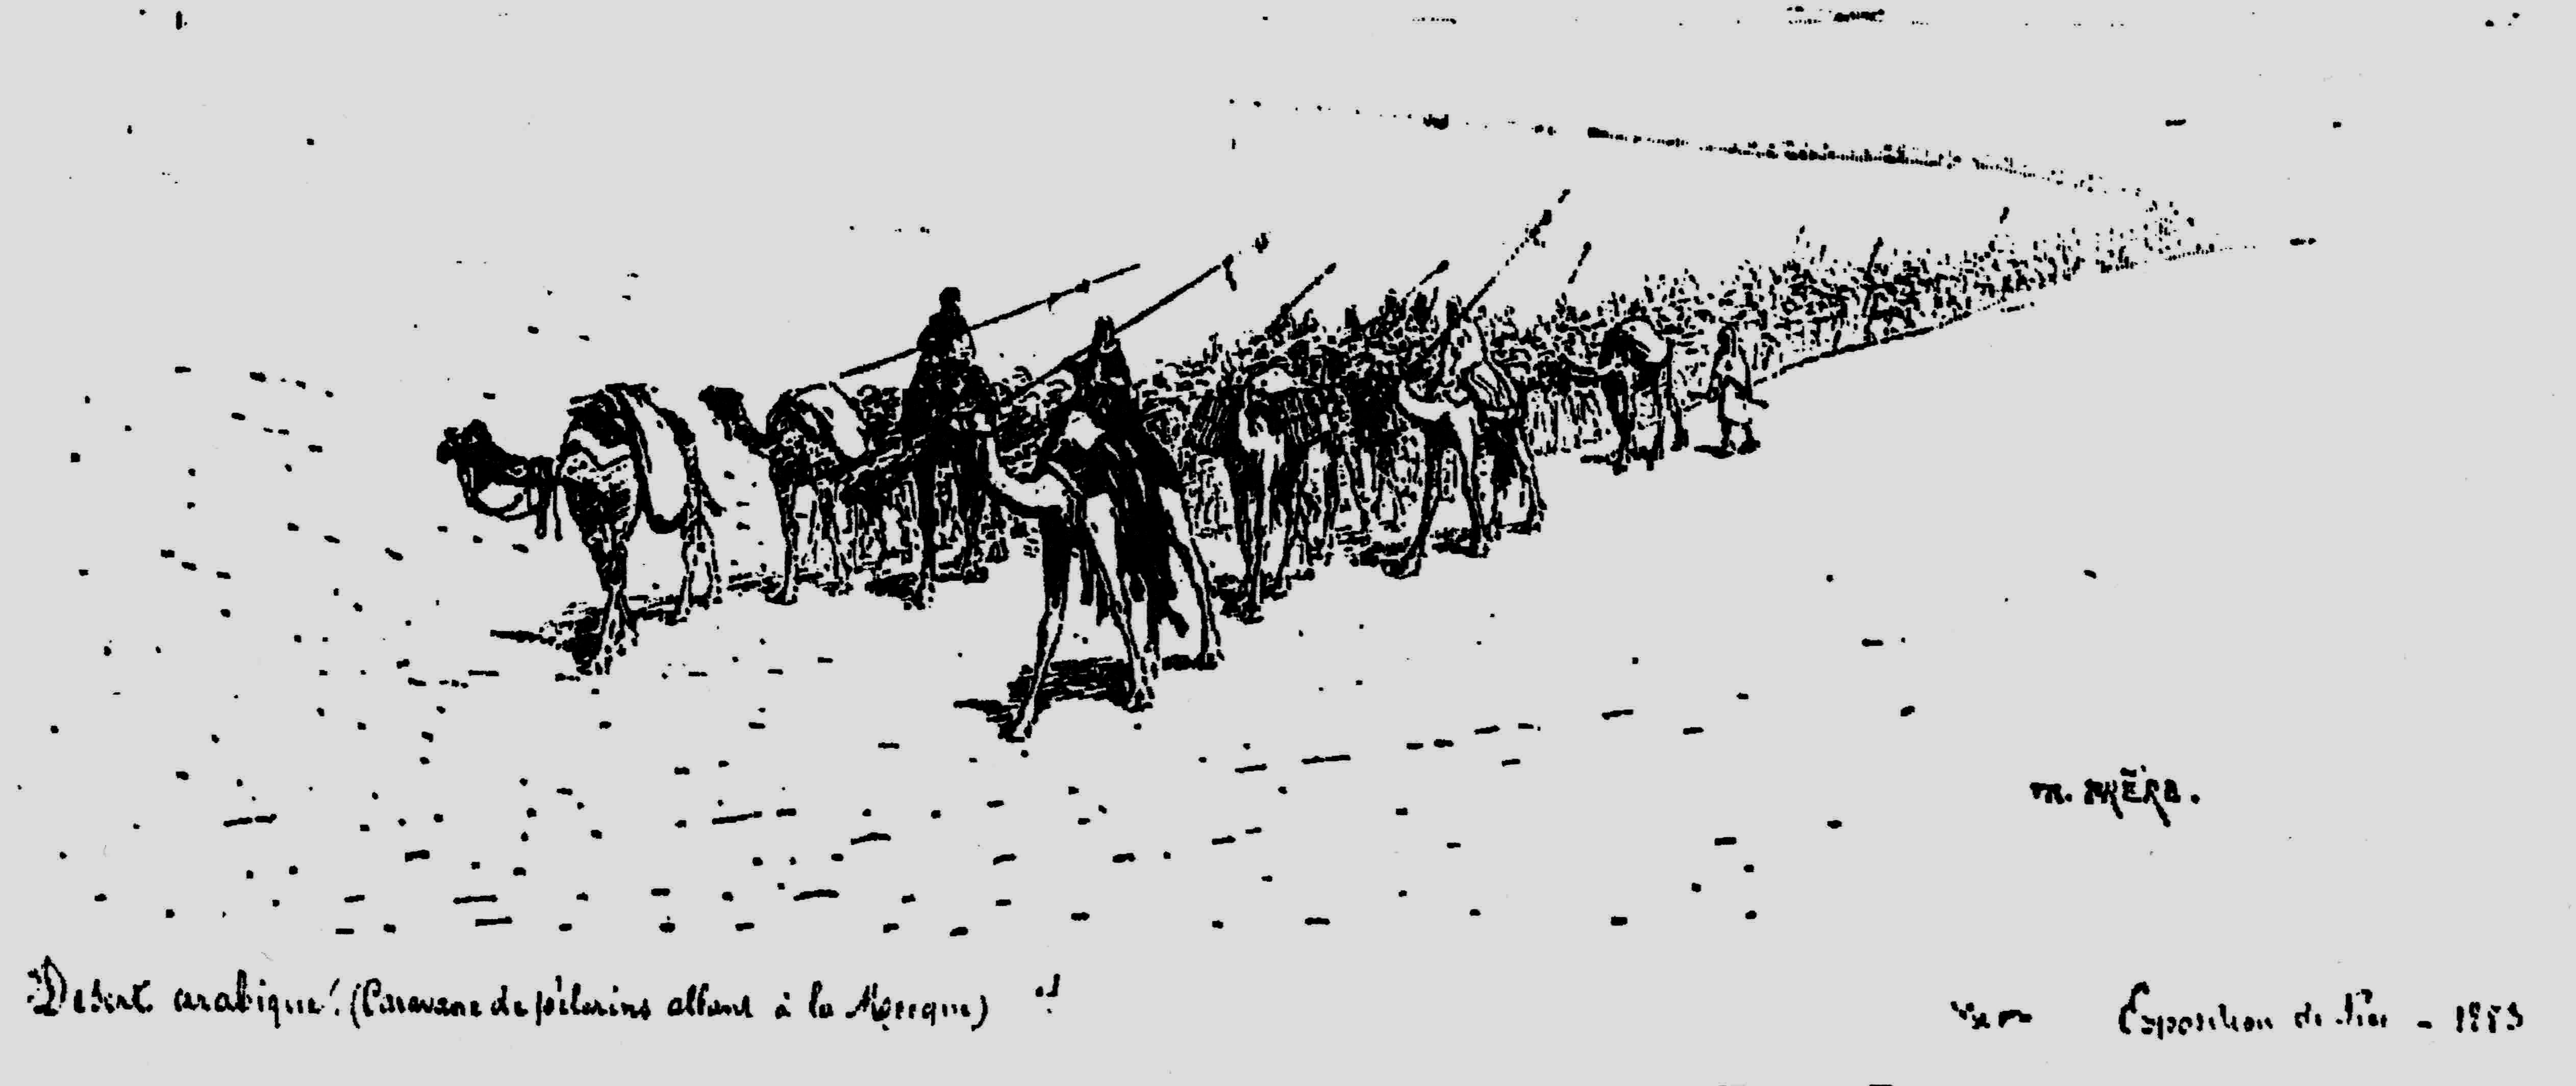 Caravane vers La Mecque (Theodore Frere)